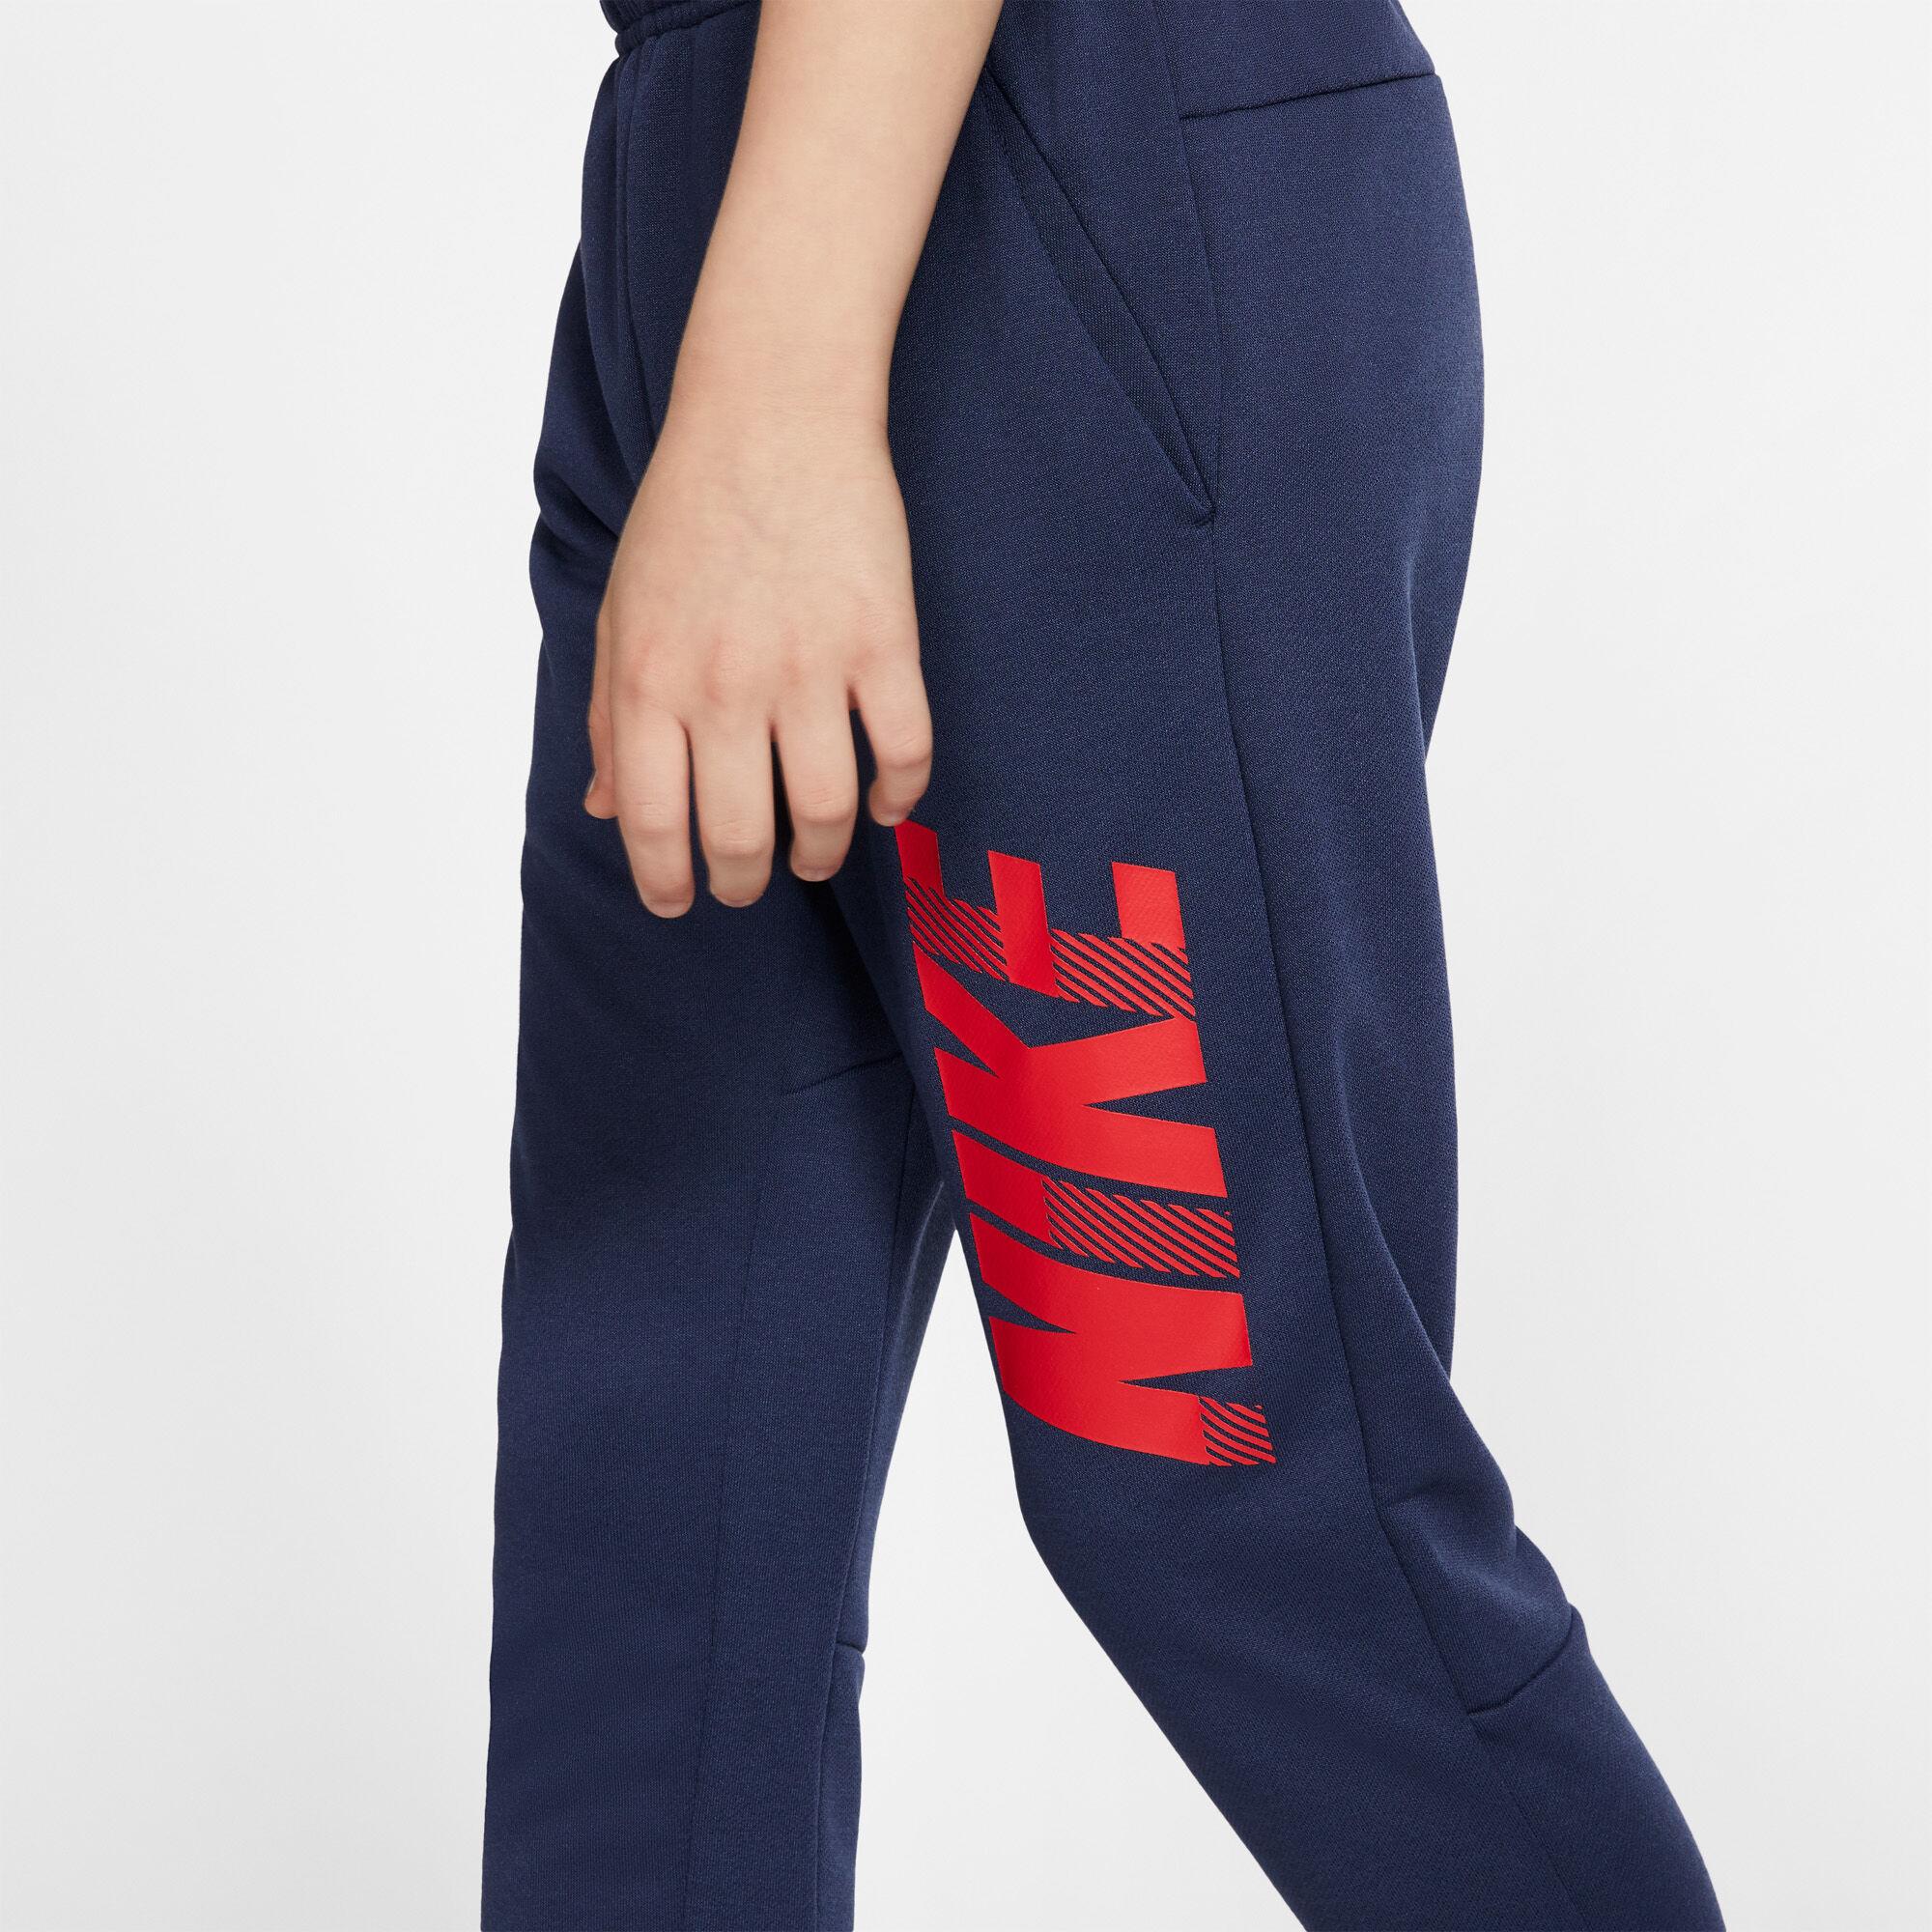 Nike | Dri FIT Tapered treningsbukse junior | Bukser